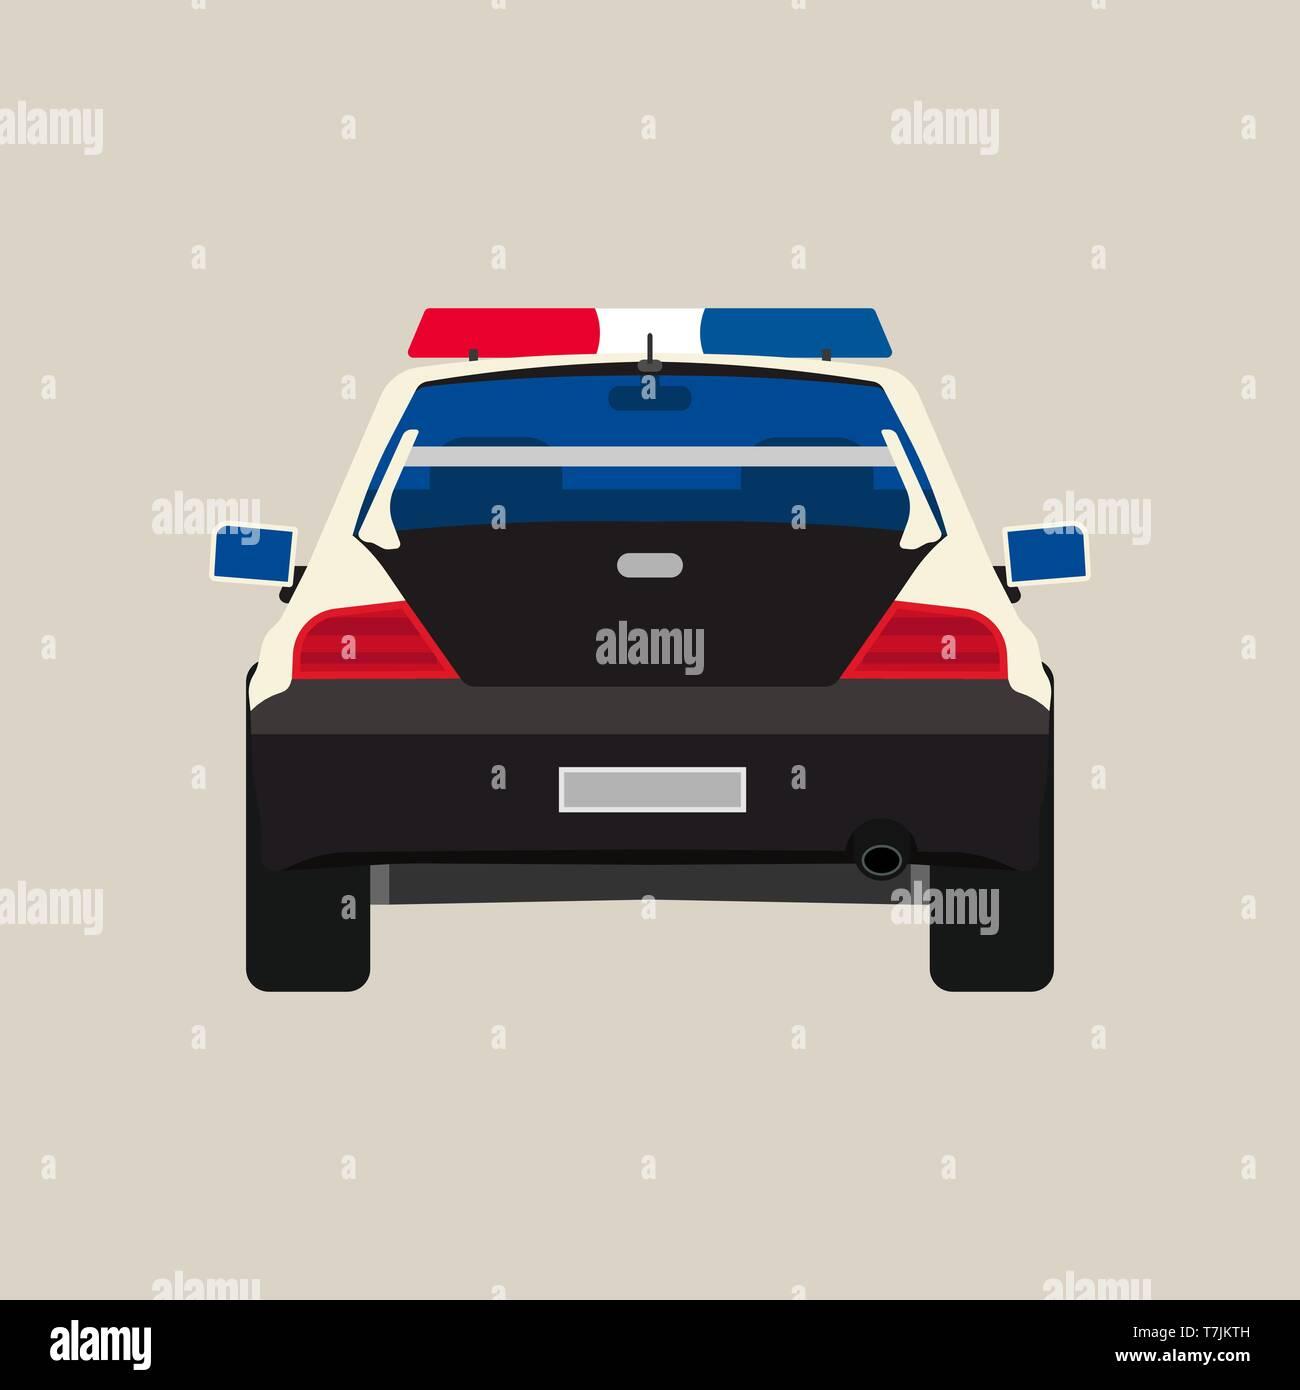 Police car back view vector flat icon. Vehicle cop isolated black patrol crime. Urban guard sheriff sedan headlight - Stock Image